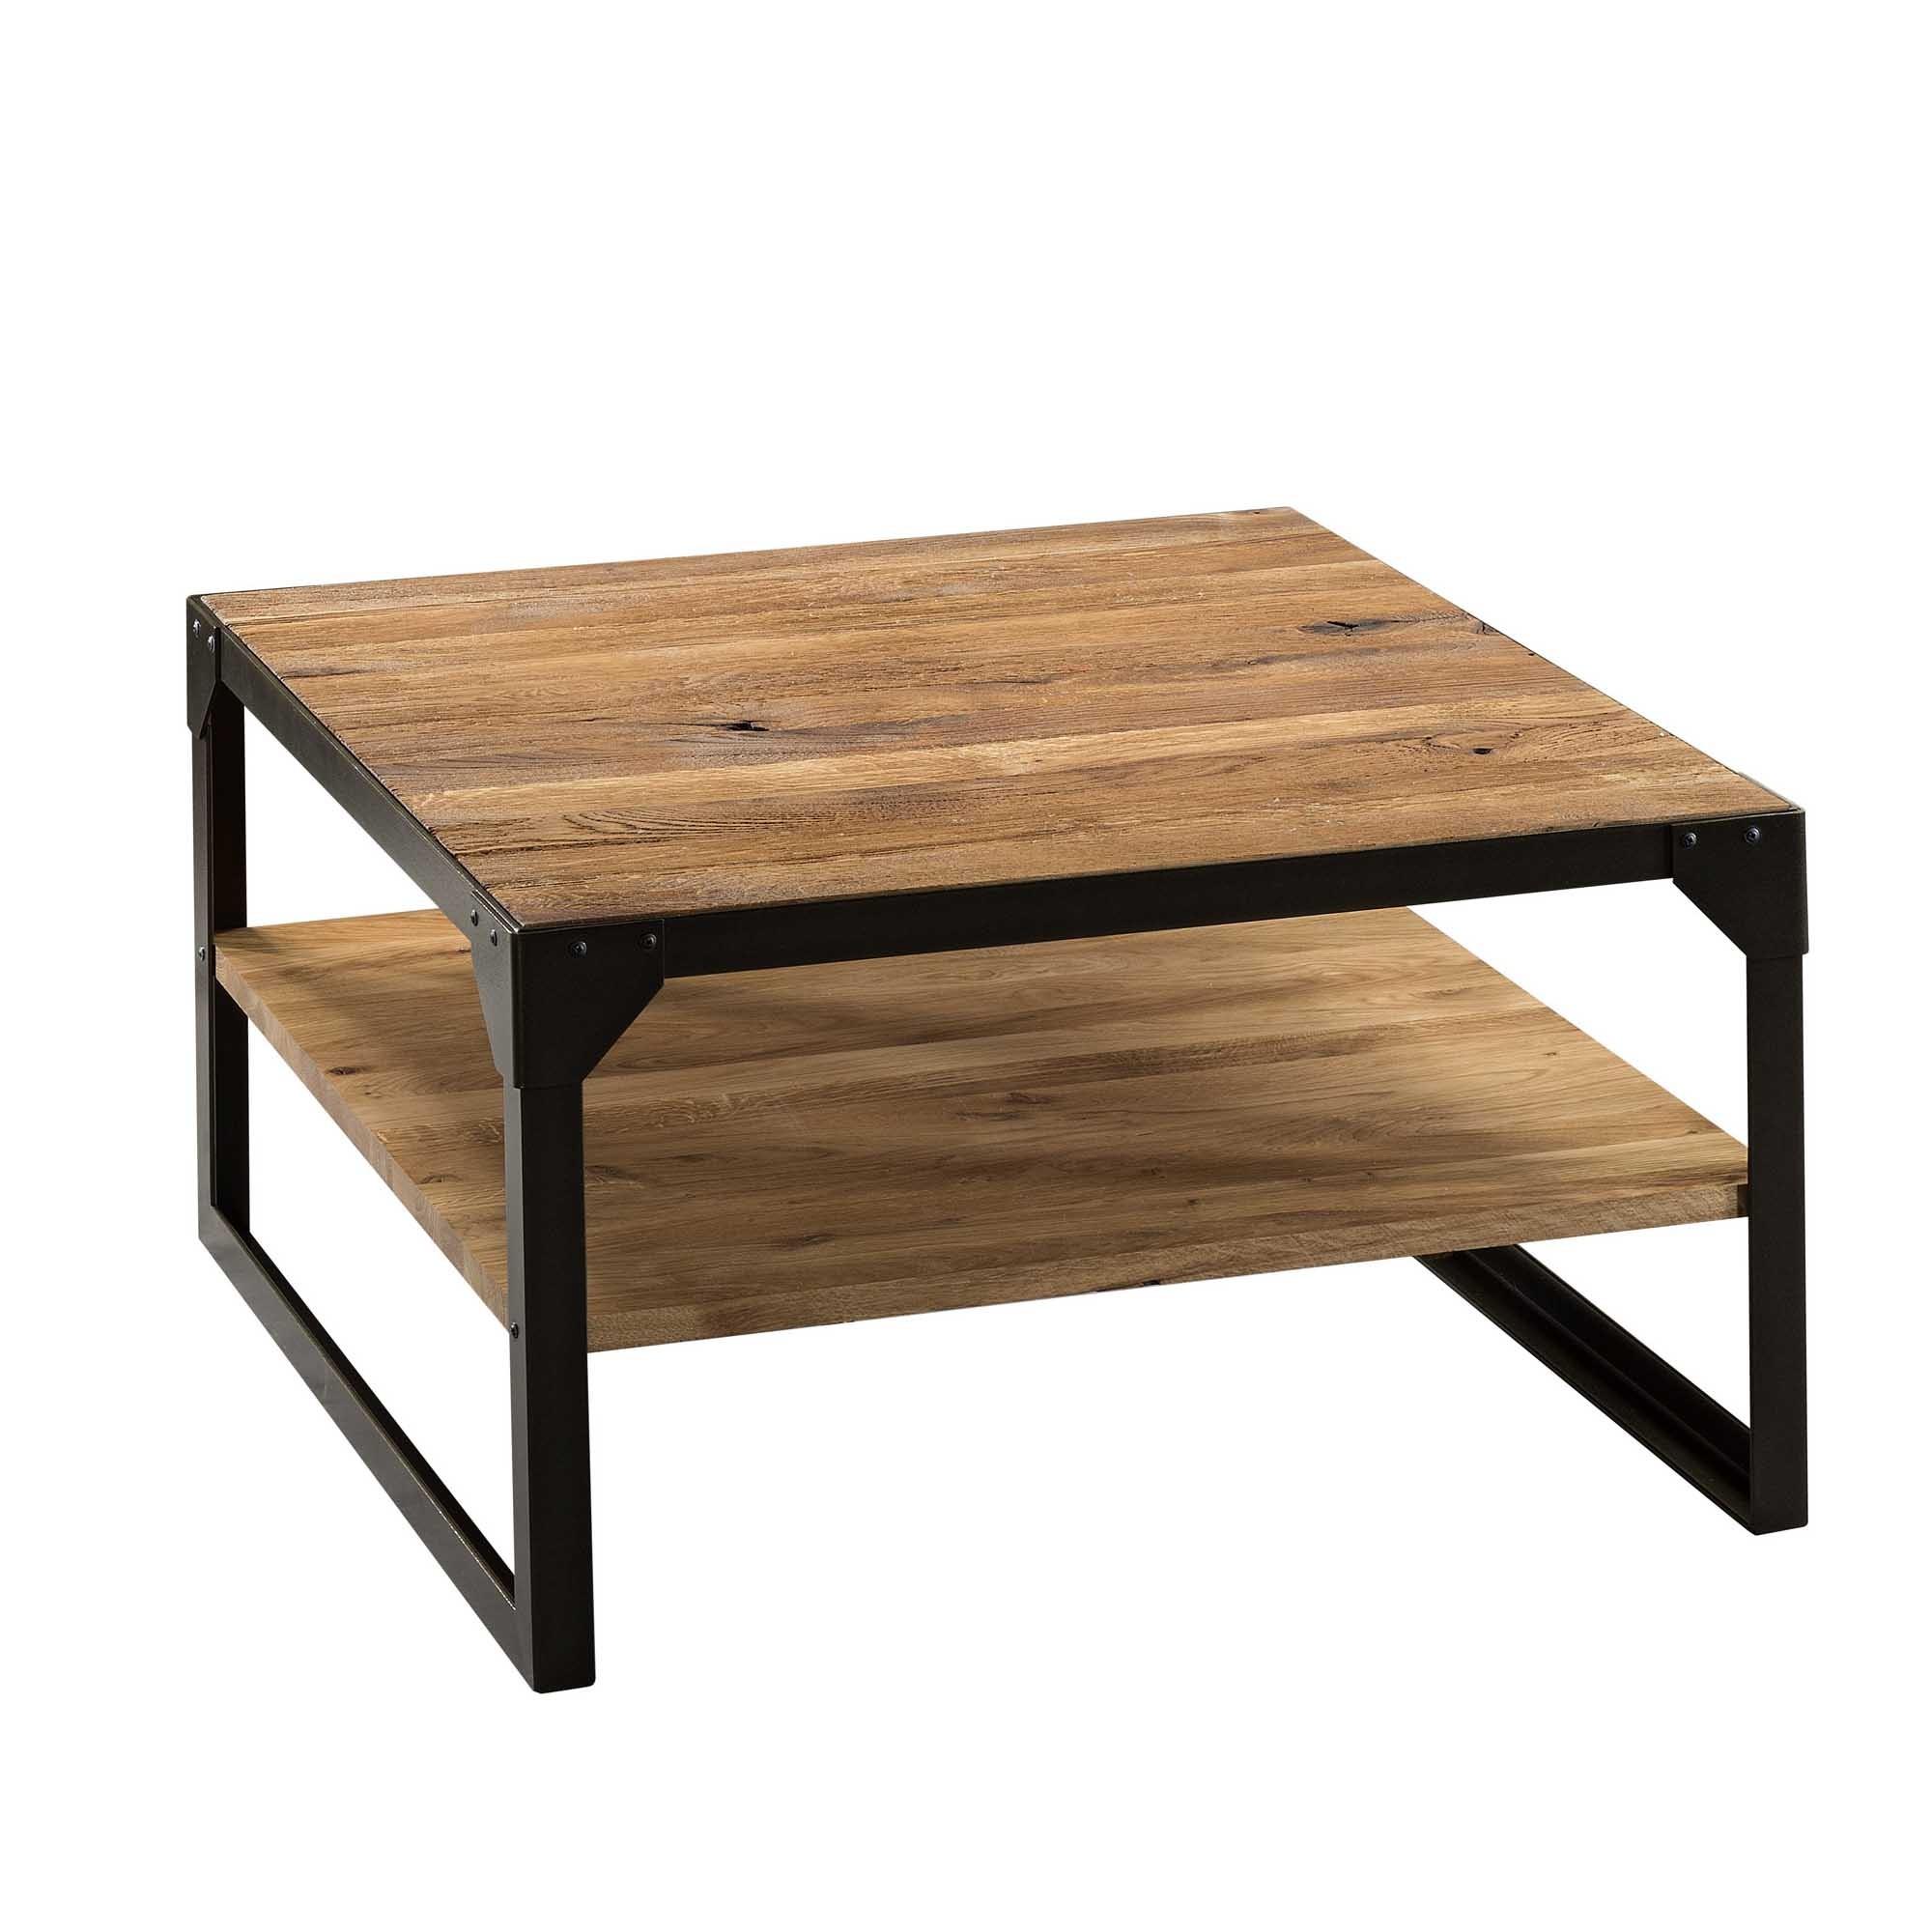 sirius nowoczesna sofa 230 cm z metalowymi nogami. Black Bedroom Furniture Sets. Home Design Ideas